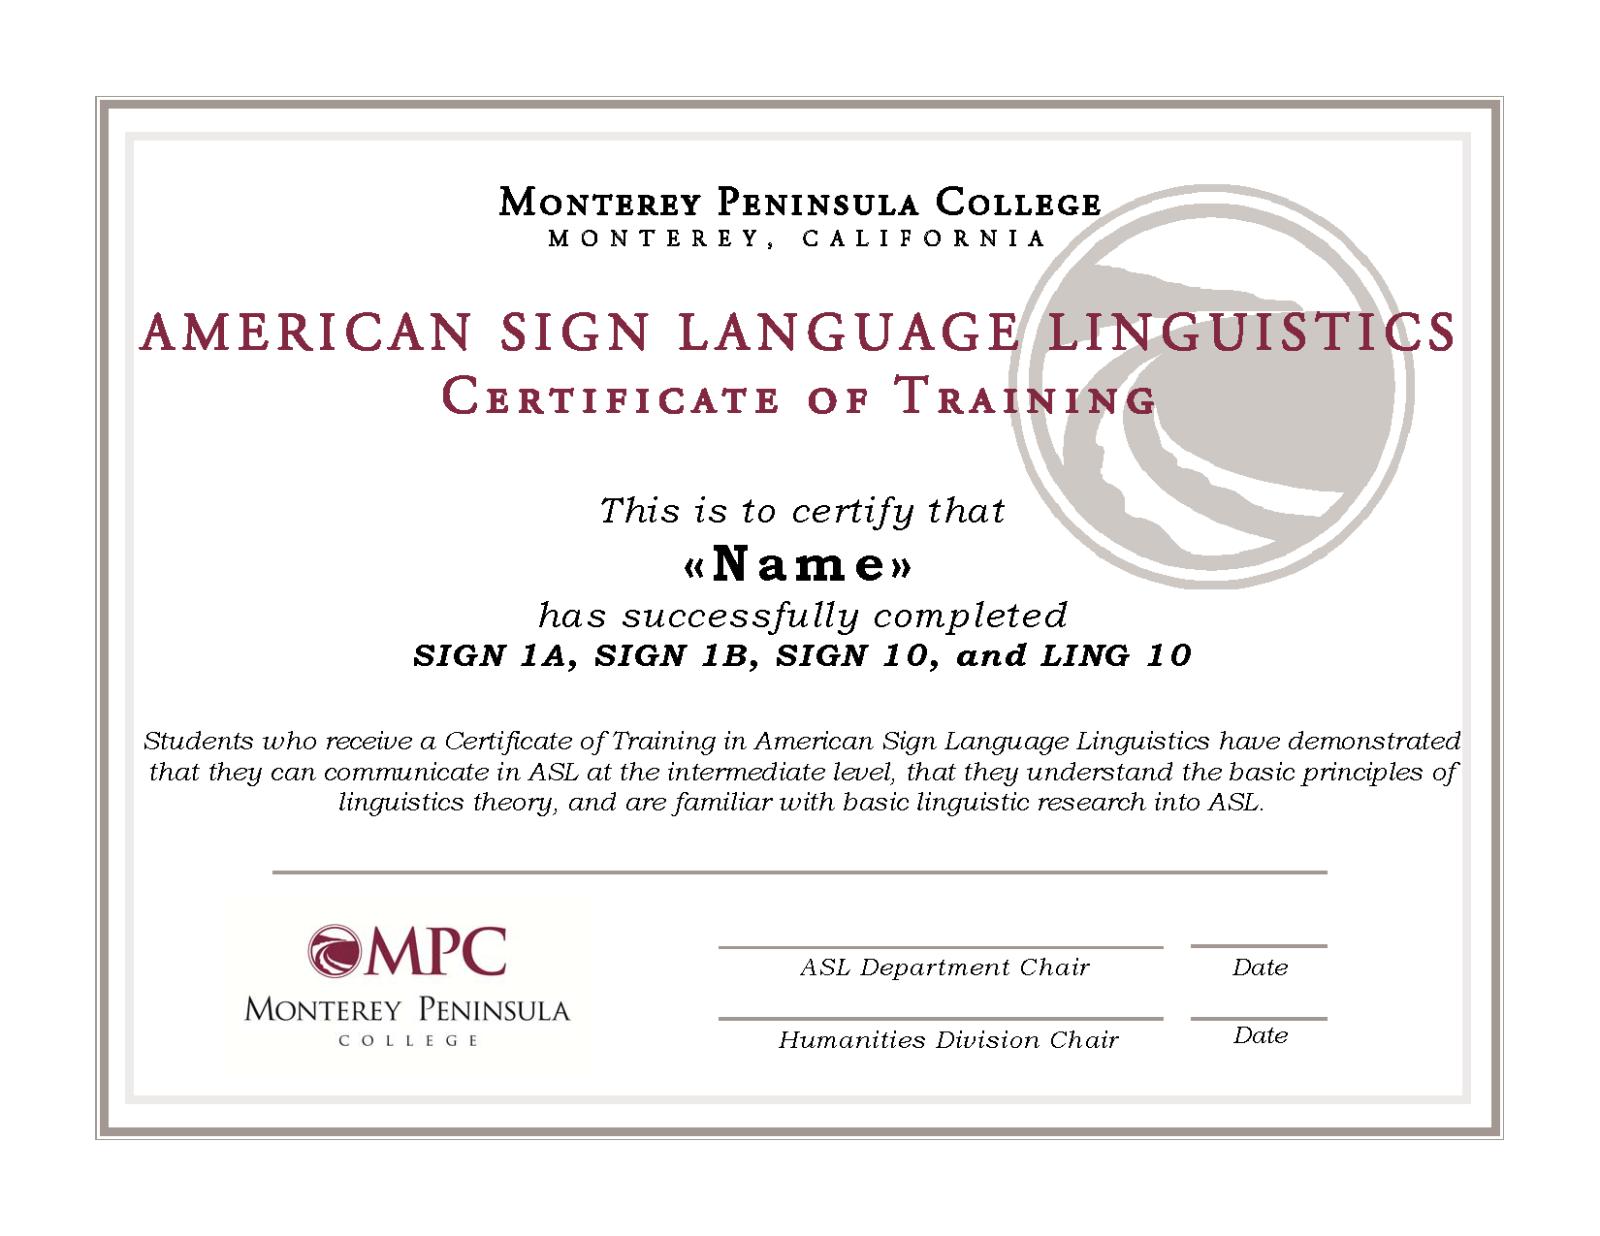 Certificate Of Training In Asl Linguistics Monterey Peninsula College